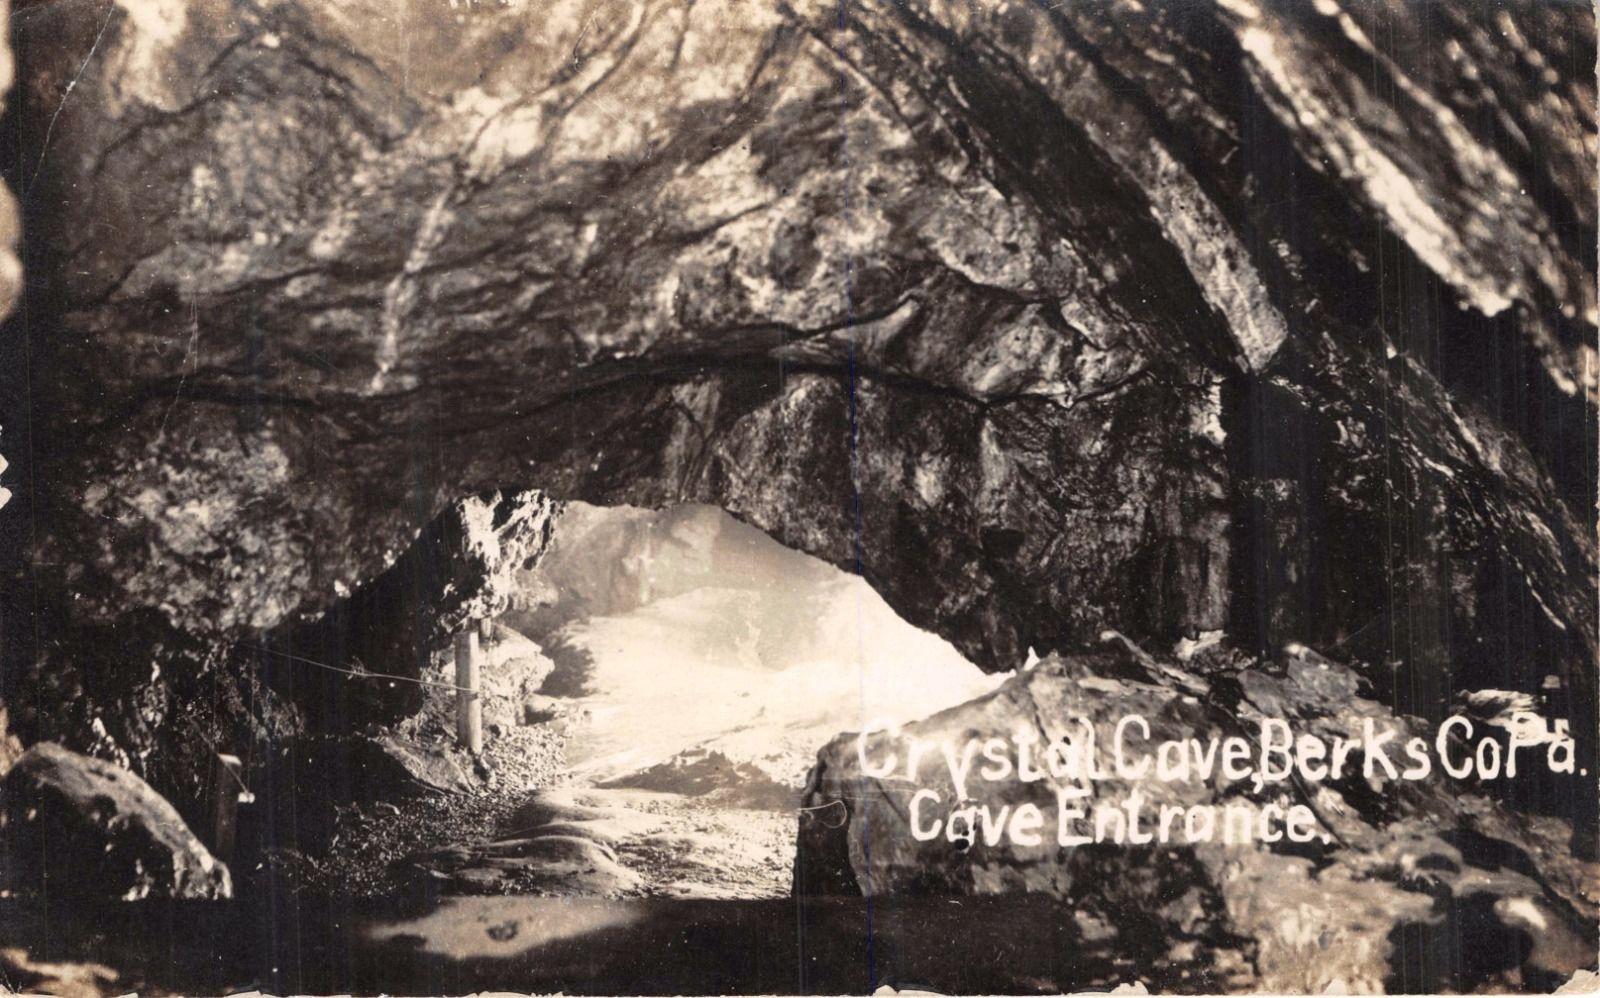 berks county virginville pennsylvania crystal cave entrance real photo postcard hippostcard